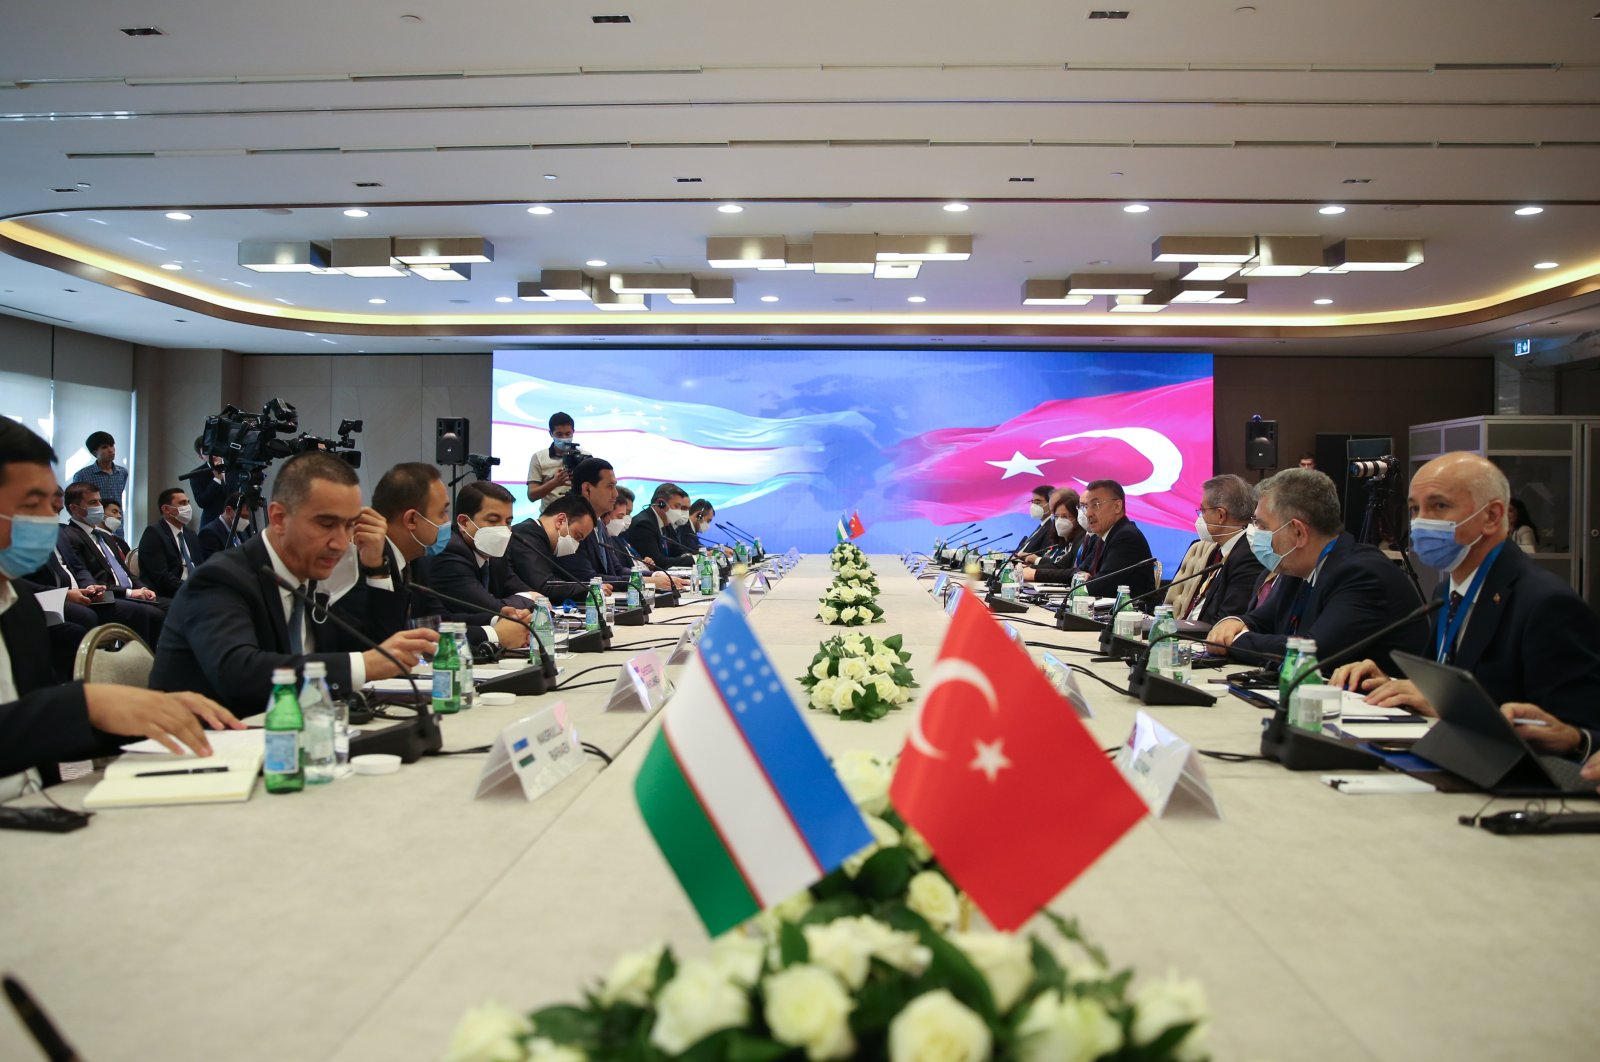 Turkish and Uzbek delegations meet at the 6th Meeting of Turkey-Uzbekistan Joint Economic Commission, Tashkent, Uzbekistan, June 28, 2021. (AA Photo)